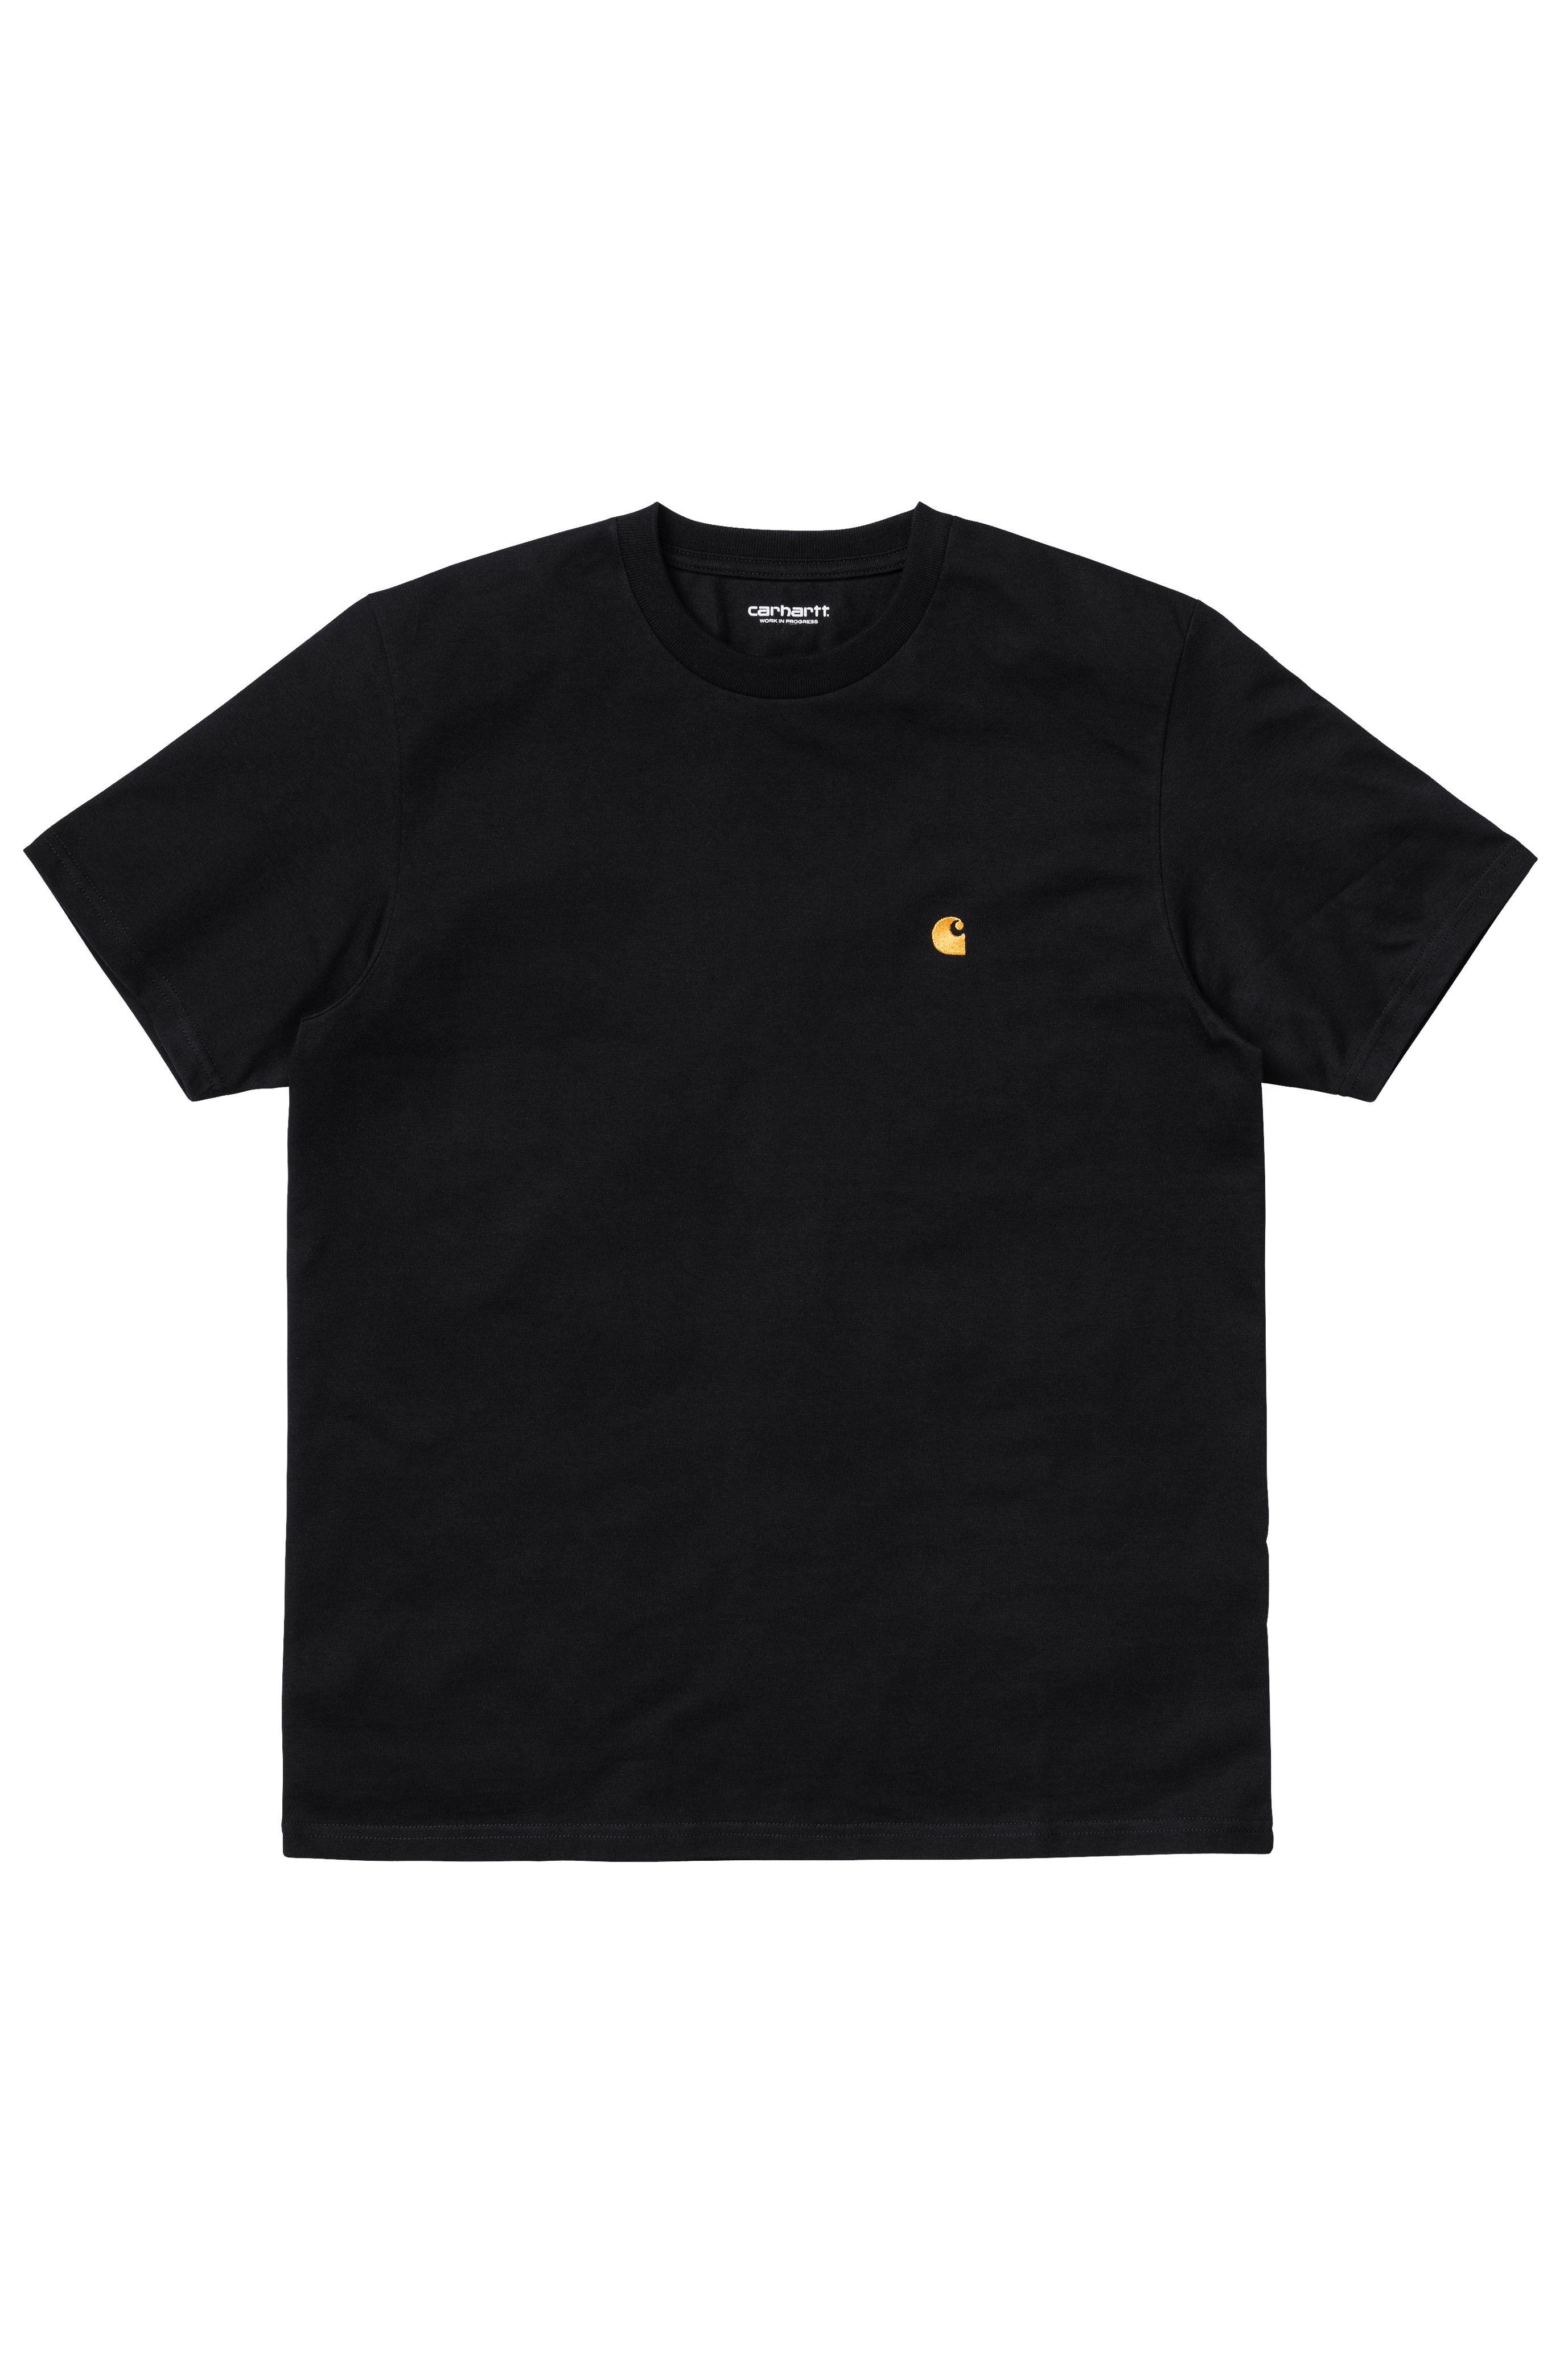 T-Shirt Carhartt WIP CHASE Black/Gold